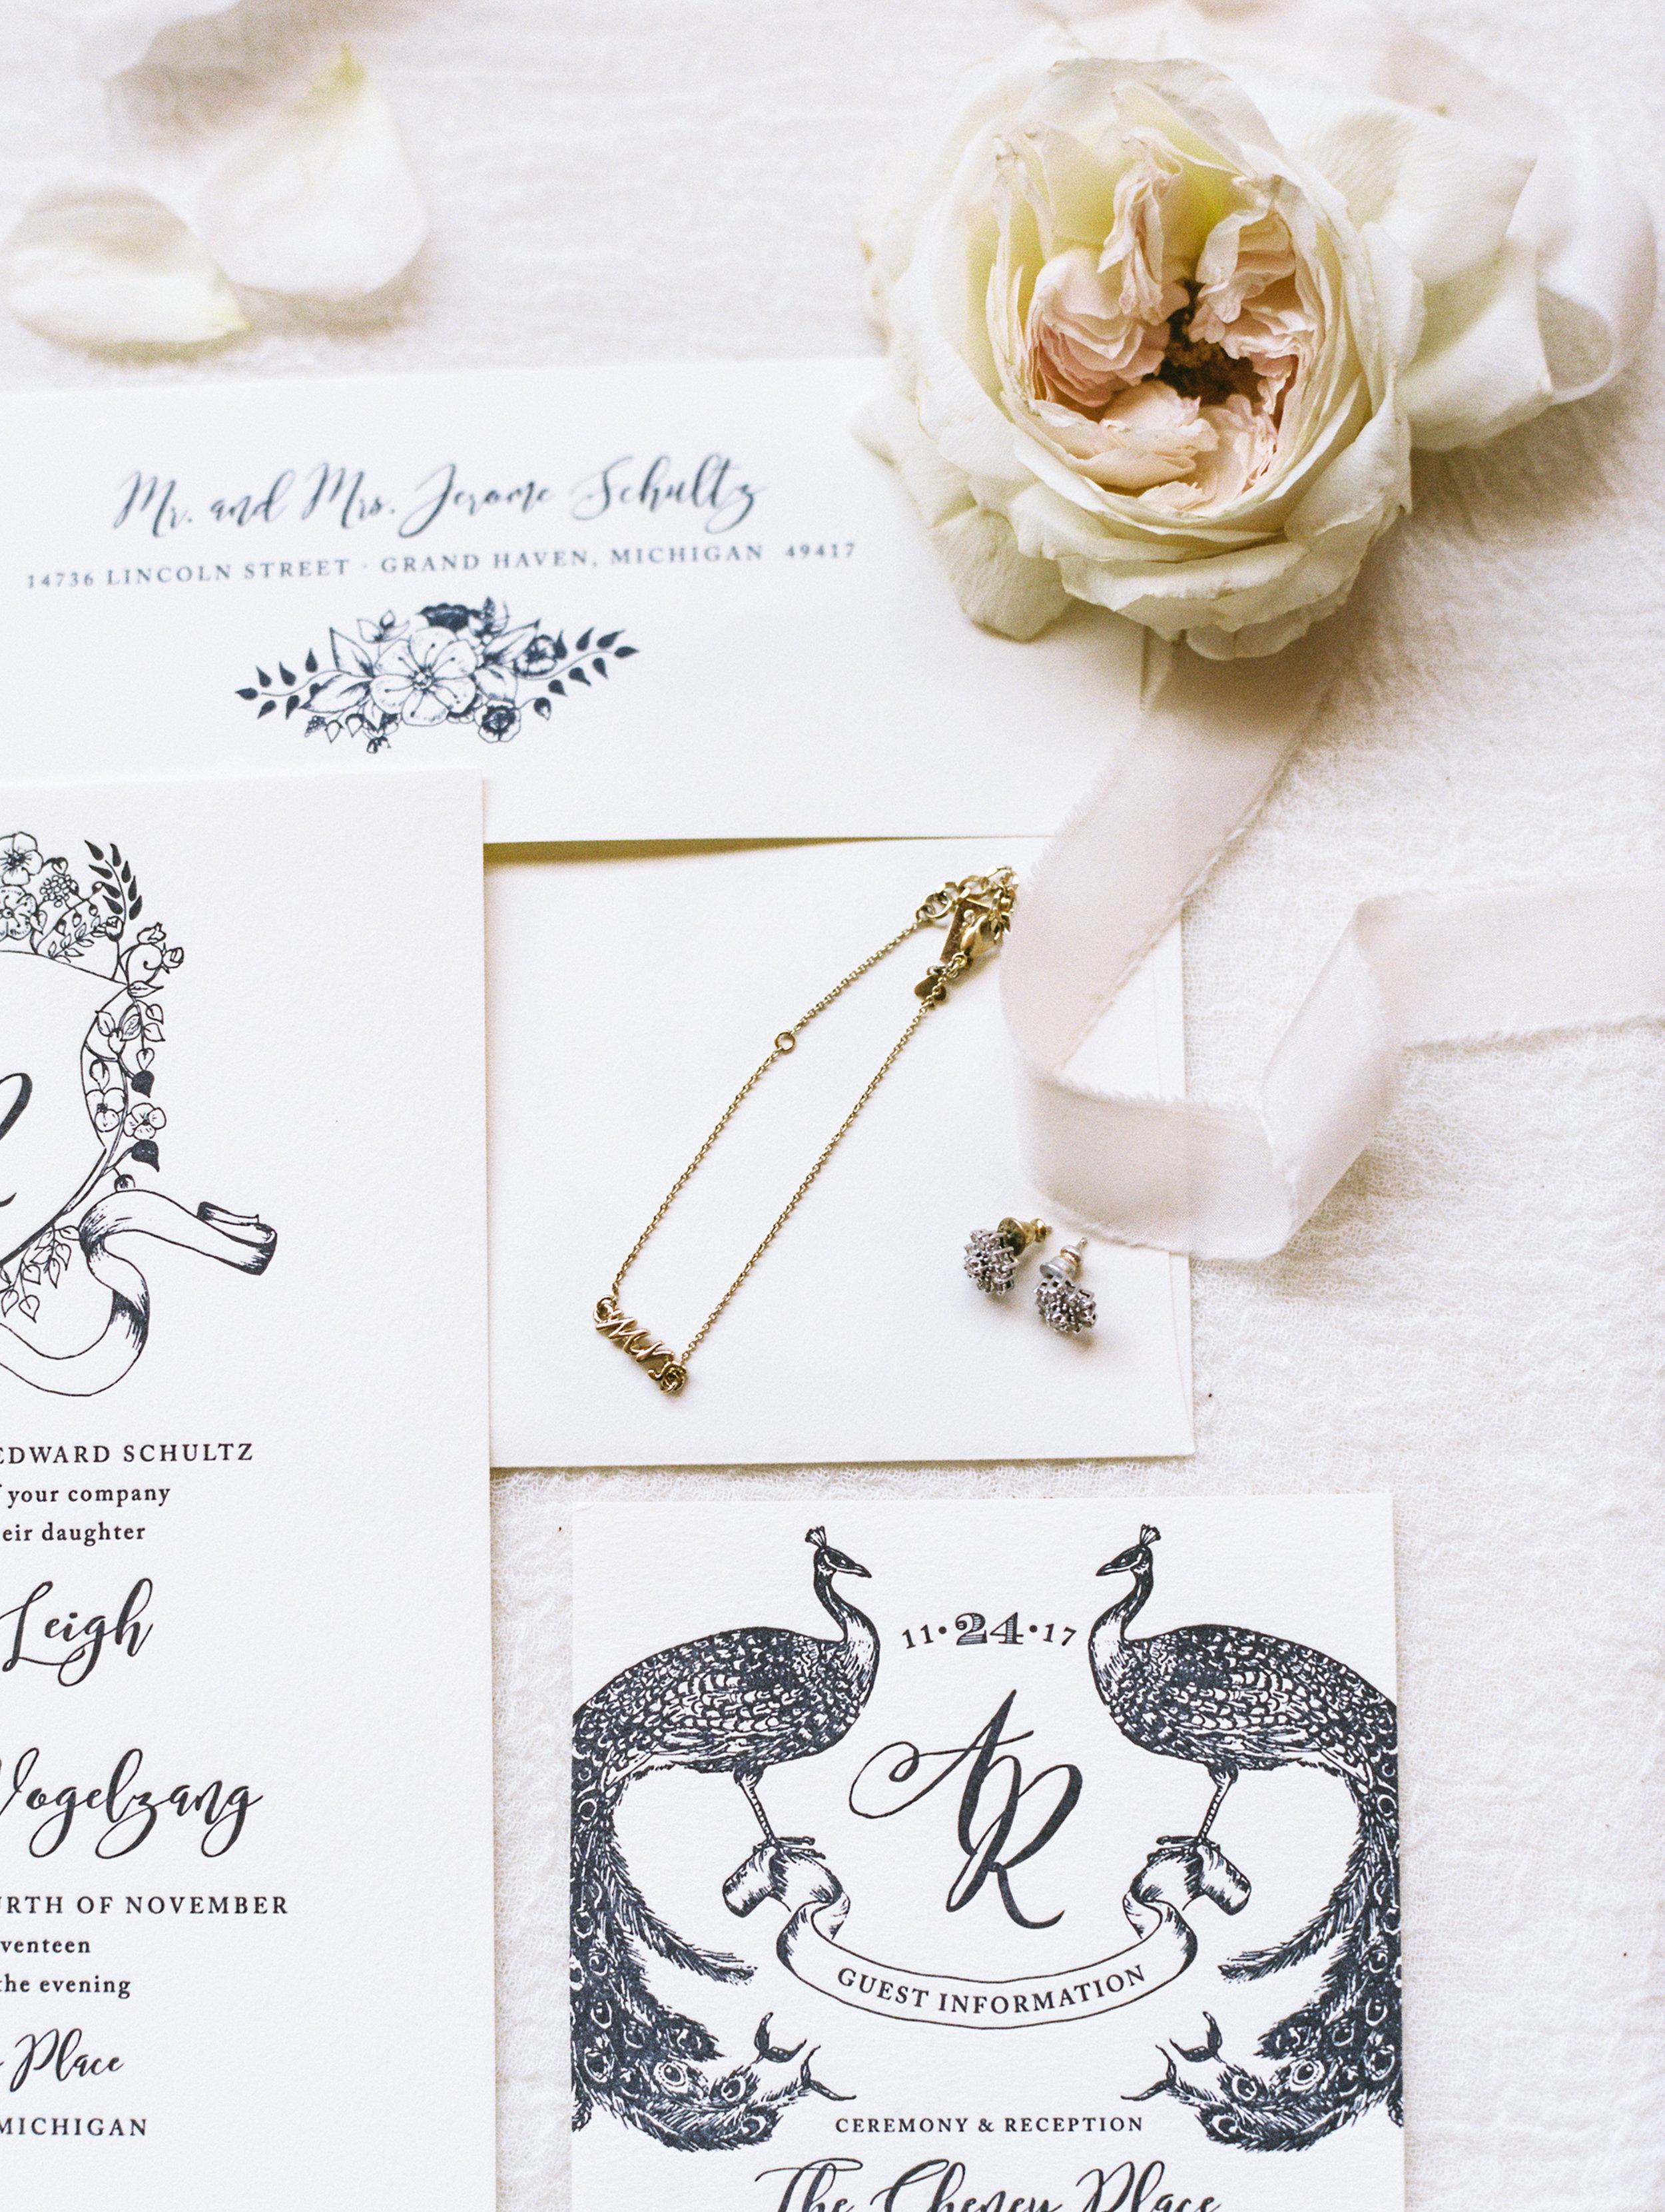 Vogelzang+Wedding+Details+b-2.jpg